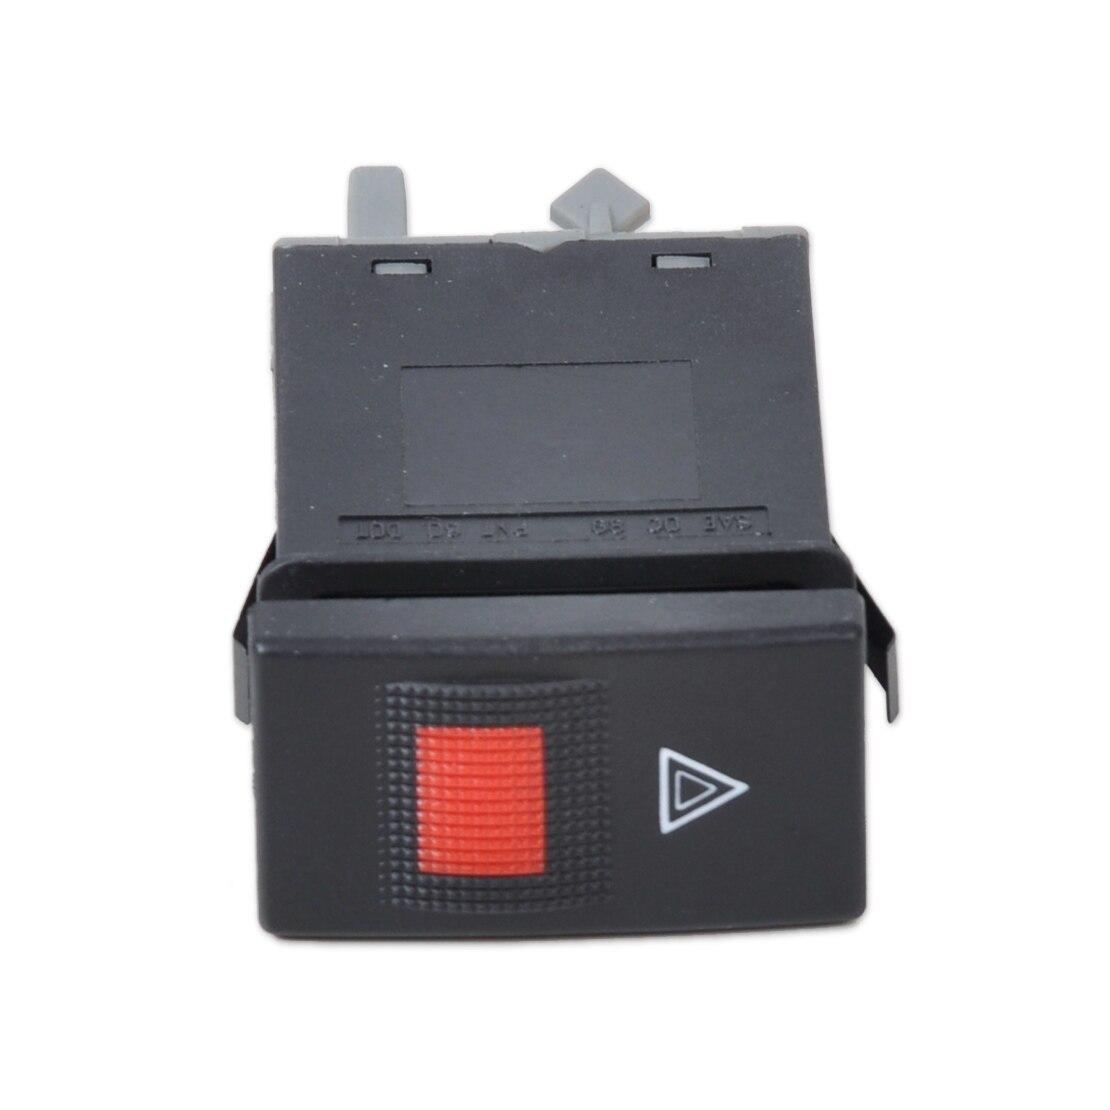 New Emergency Hazard Flasher Warn Light Switch Button For Audi A4 B5 8D0941509E